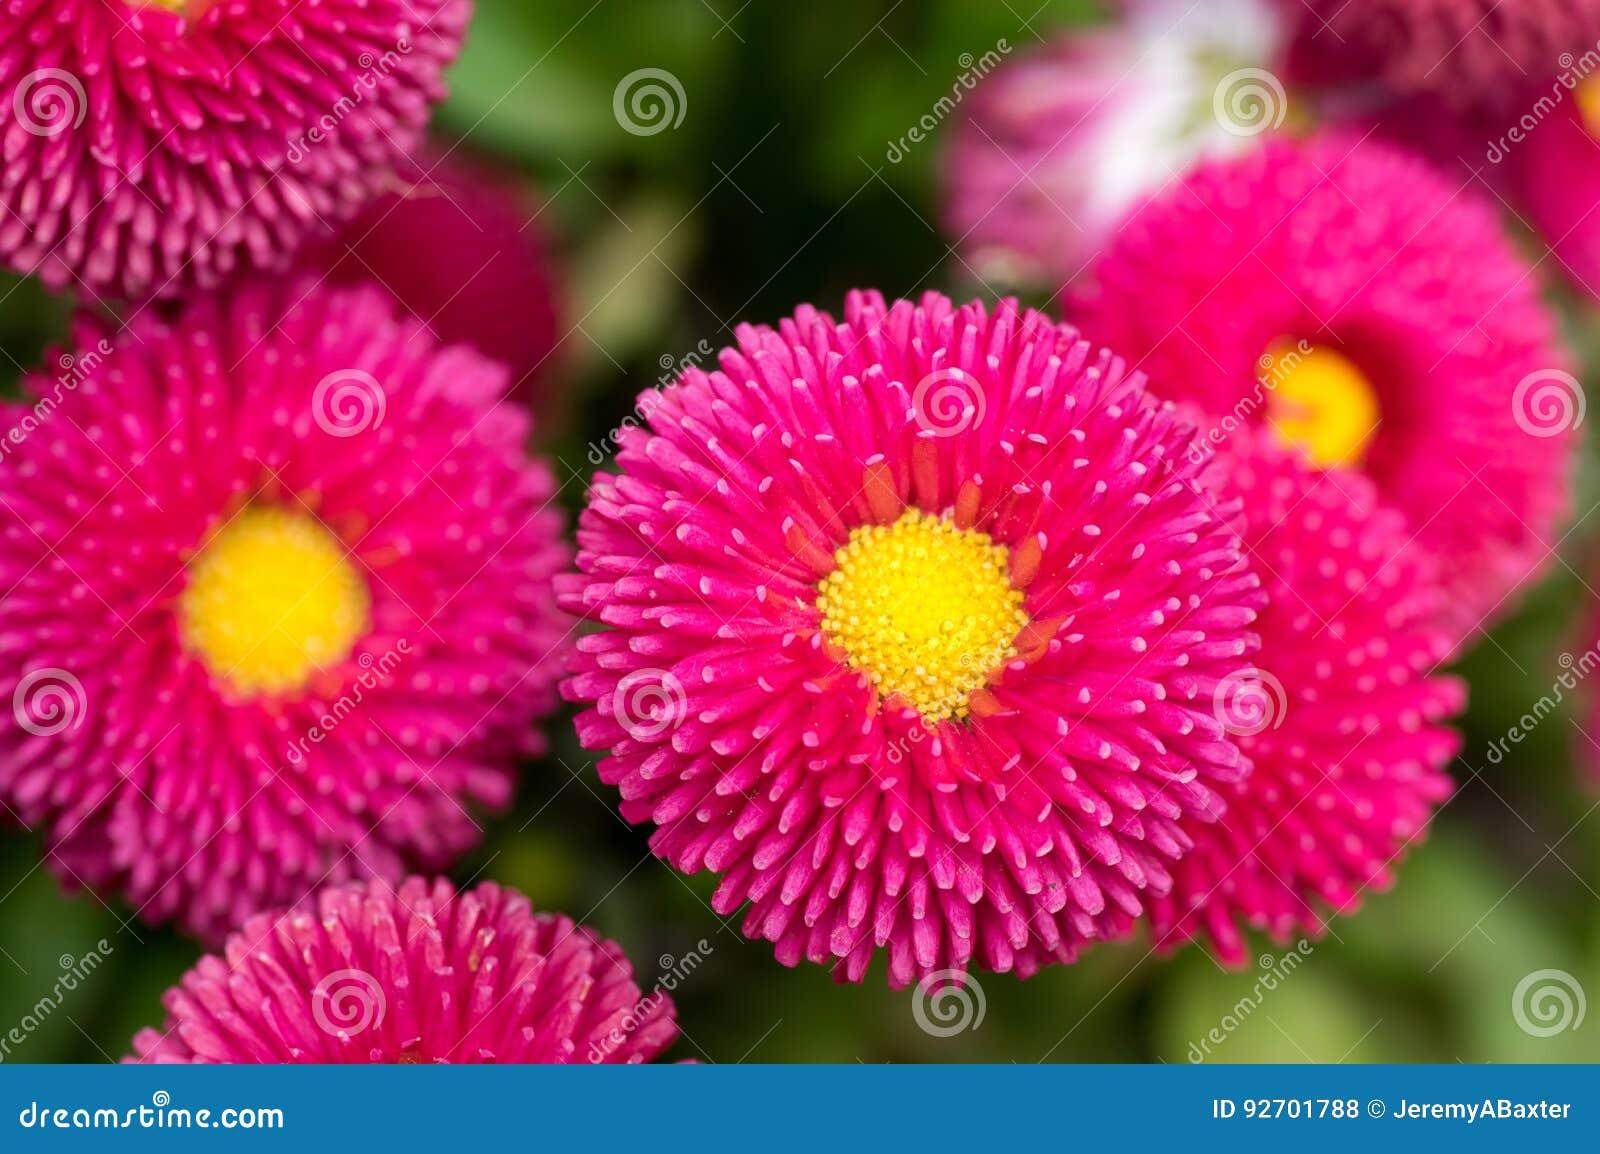 pollen englisch